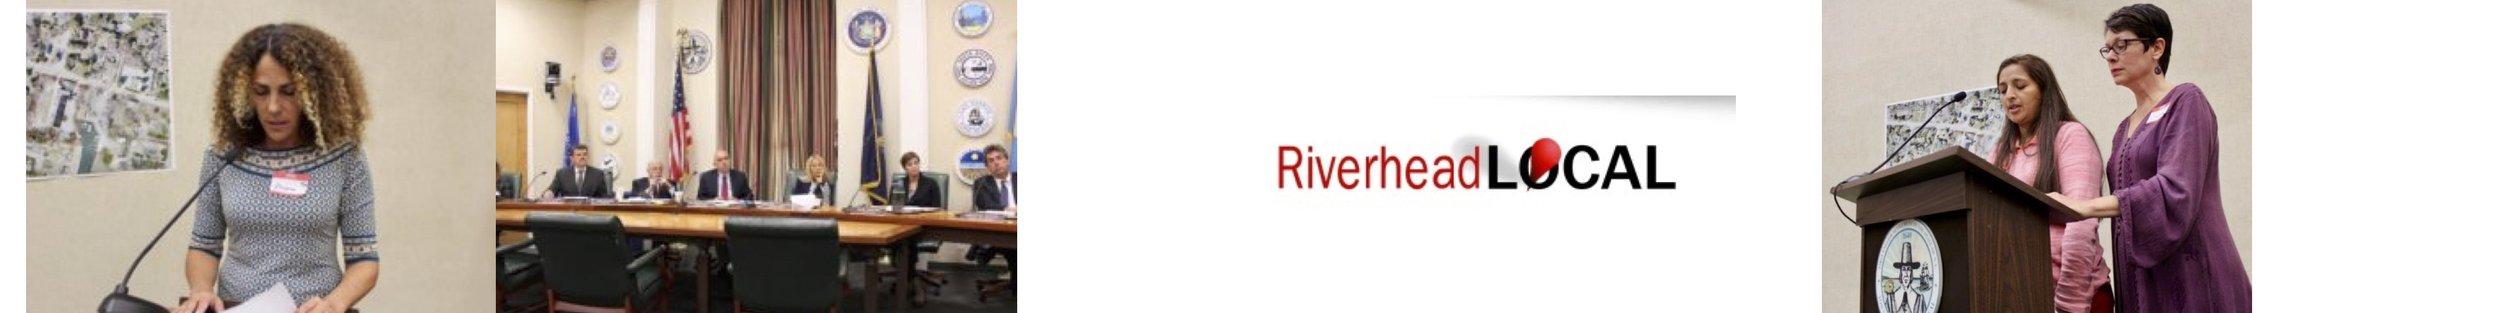 RIVERHEAD LOCAL PRESS 10.2018.jpg